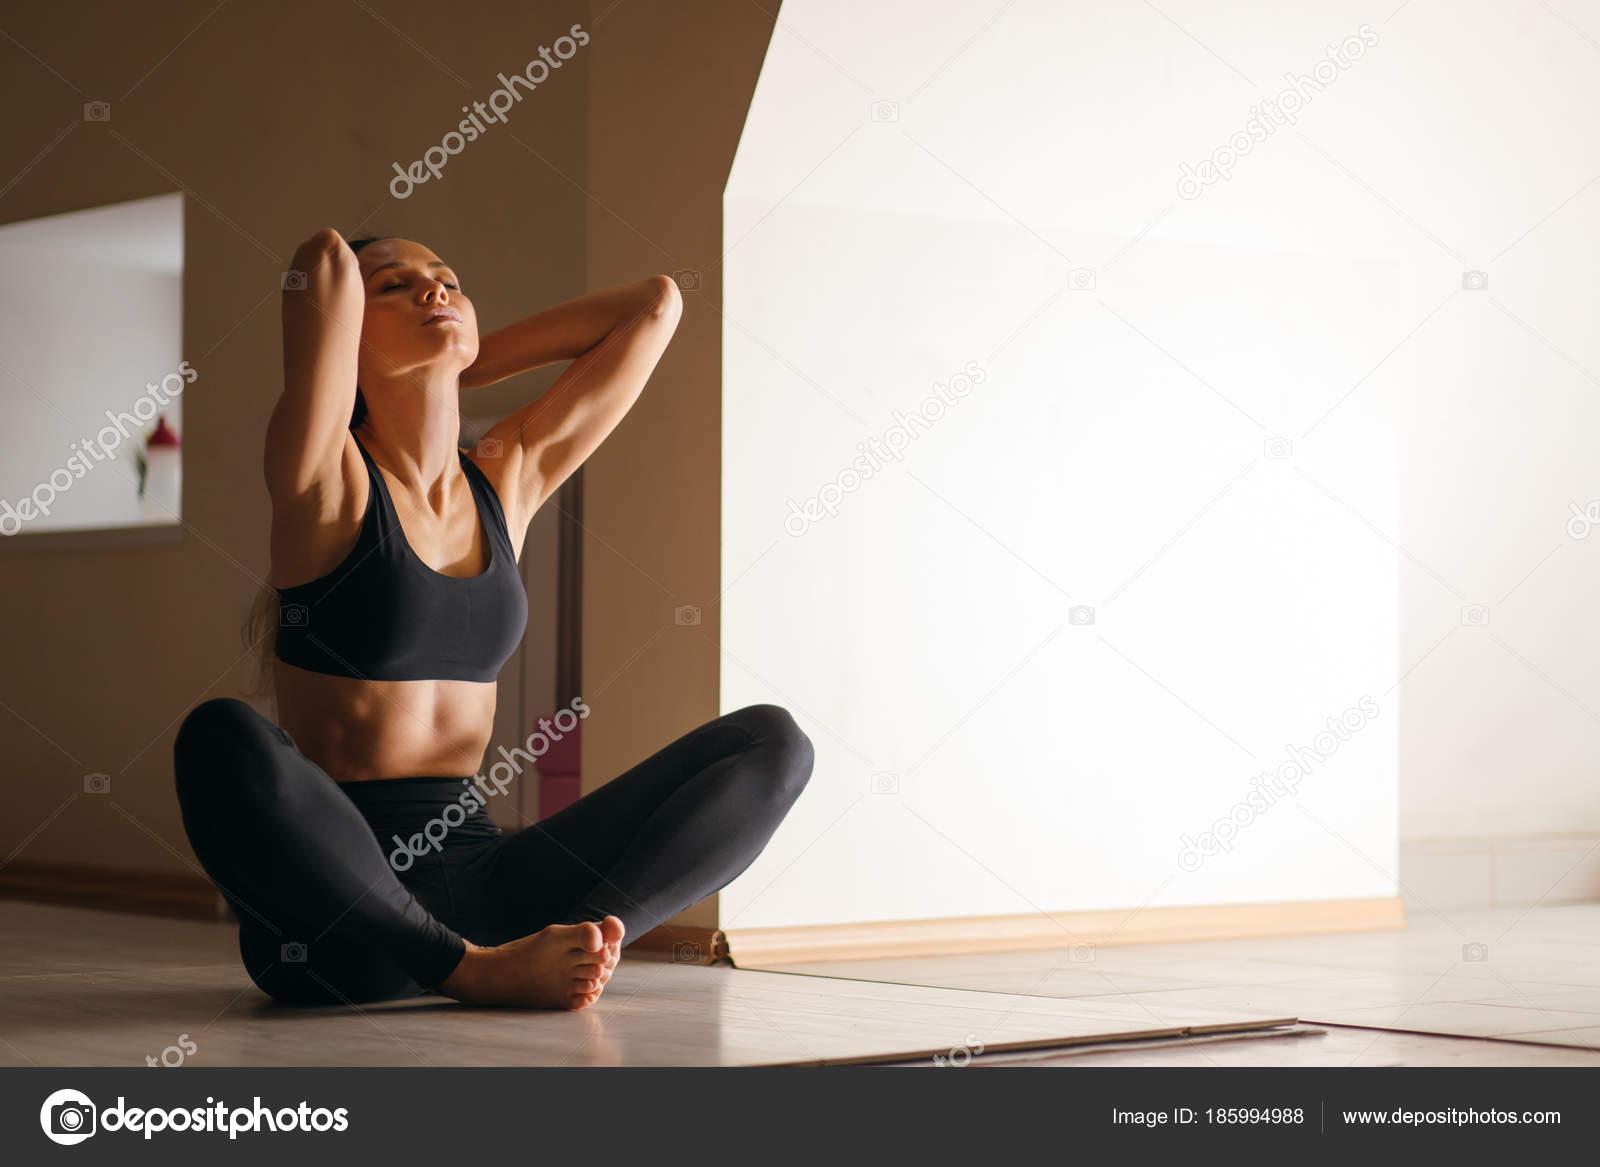 Woman Doing Yoga Exercise Sitting In Baddha Konasana Butterfly Pose Stock Photo